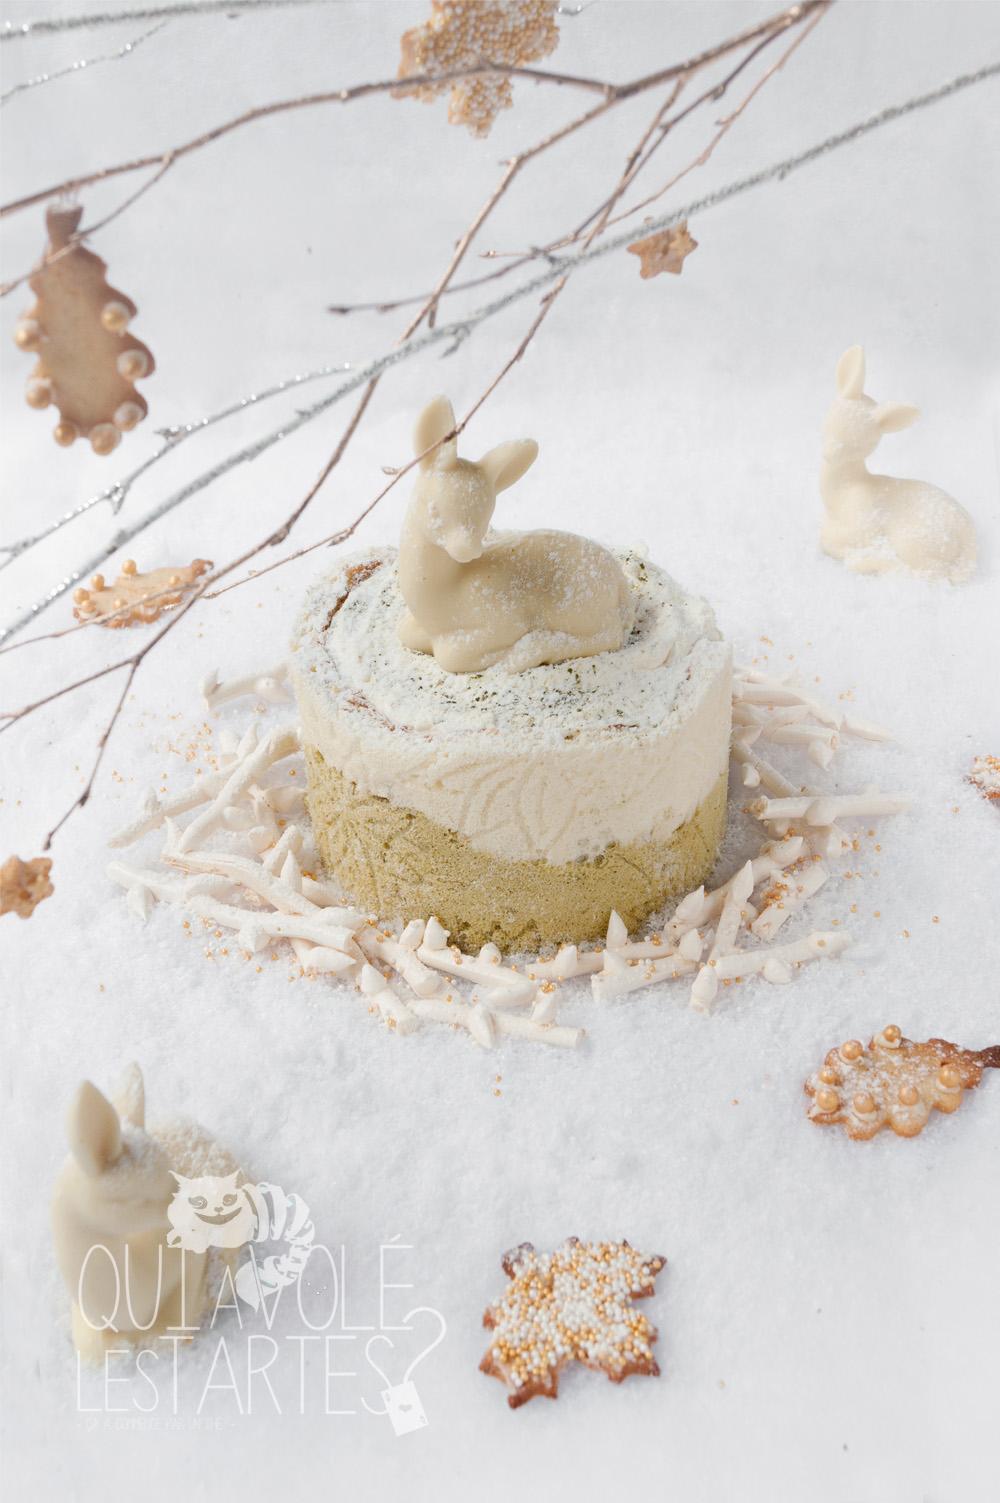 Nara 1 - charlotte sans gluten MatchaYuzu - Studio 2 créaion - Qui a volé les tartes